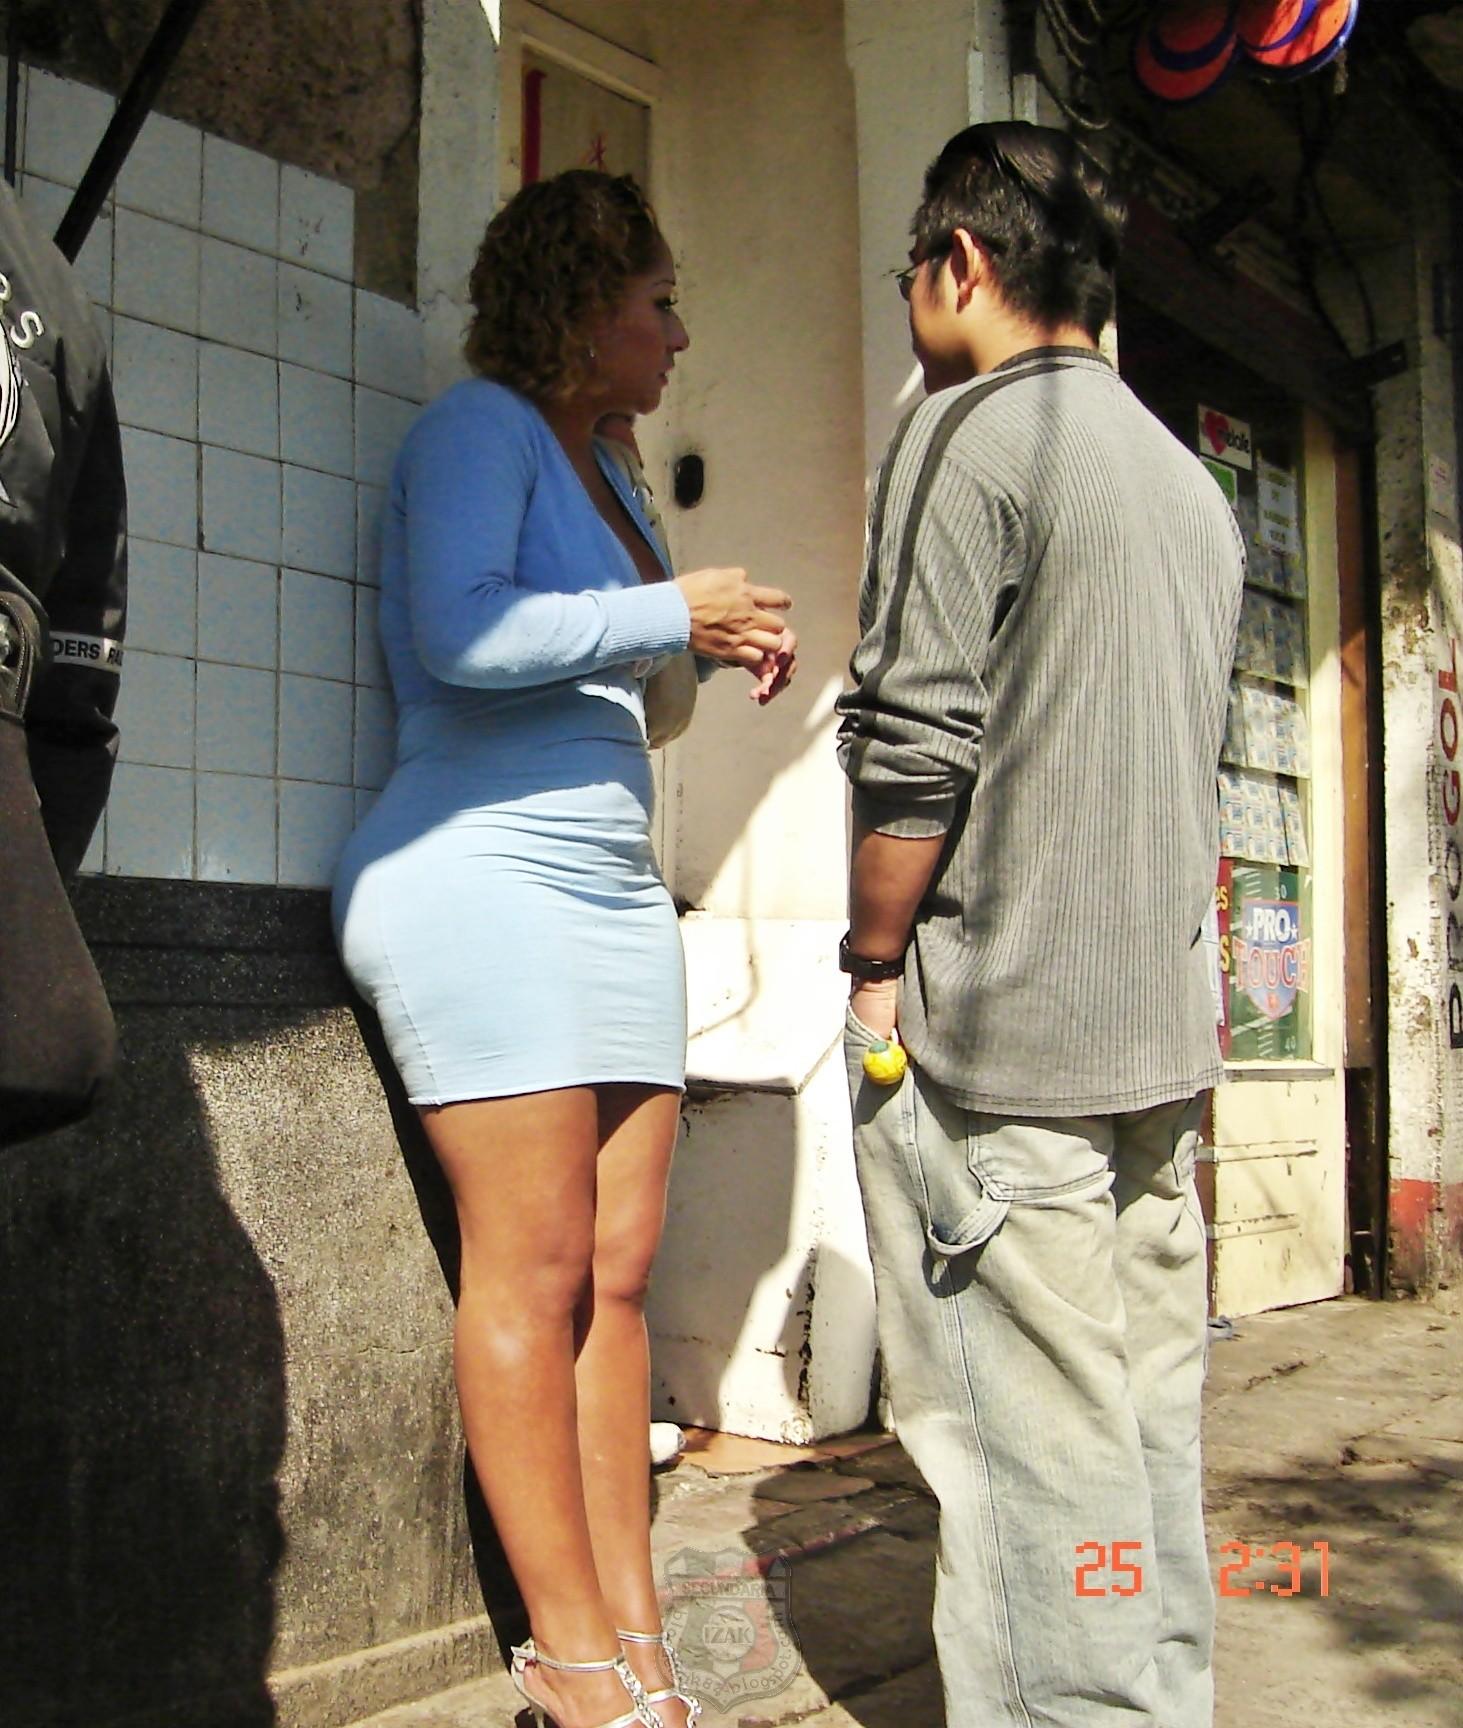 prostitutas navalmoral de la mata anuncios prostitutas en burgos